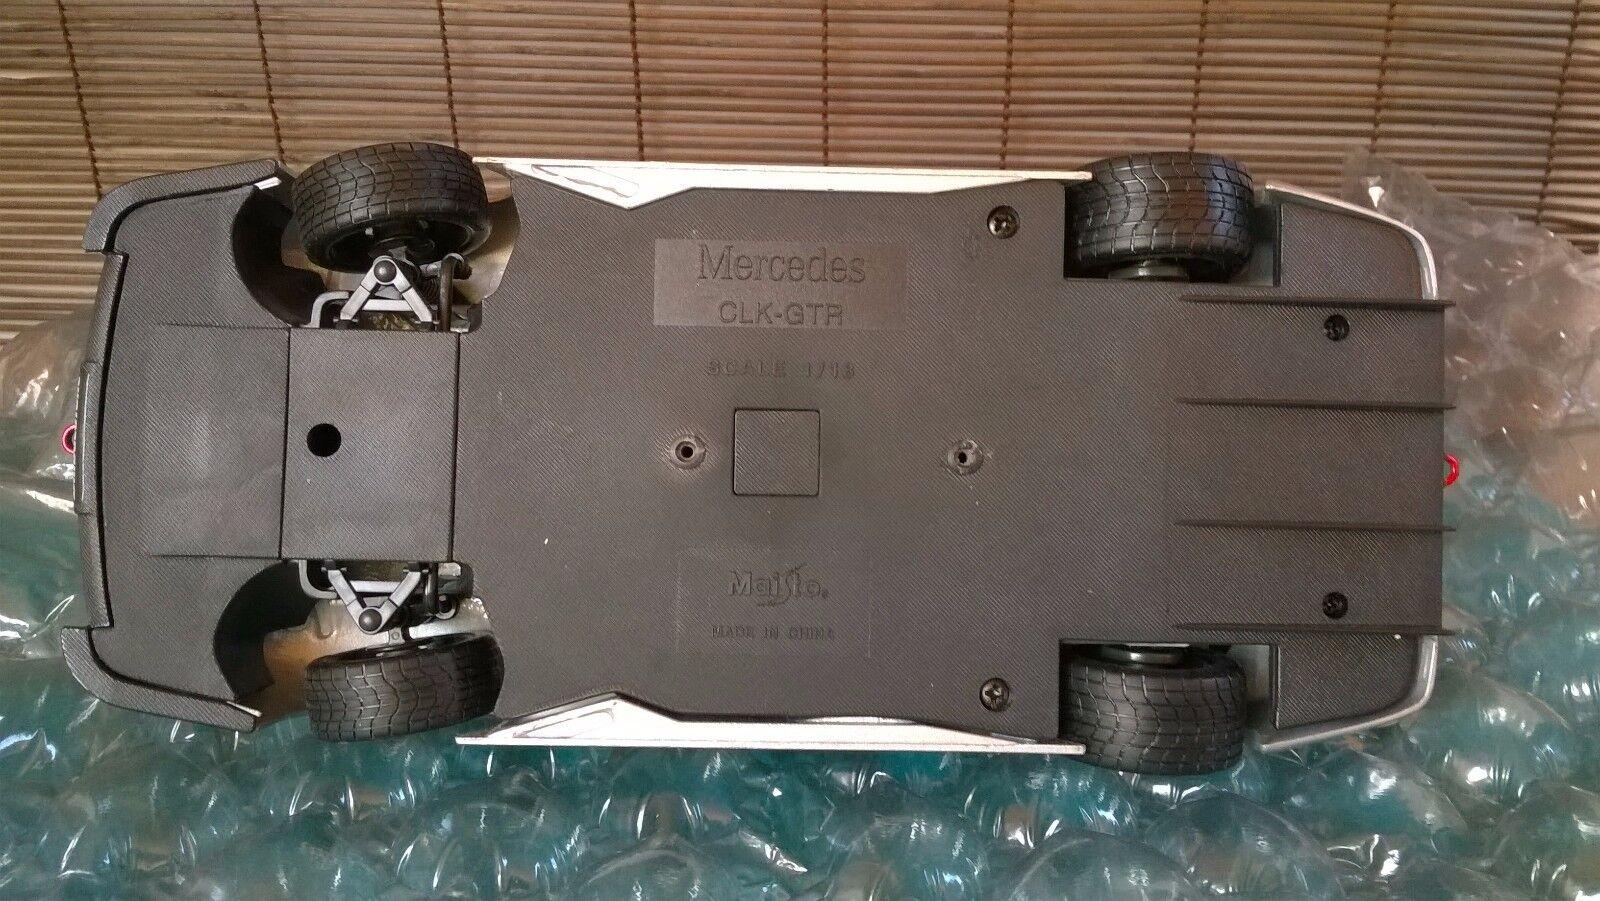 Mercedes CLK-GTR CLK-GTR CLK-GTR 1997  - Modellauto 1 18 Maisto in OVP 48457e